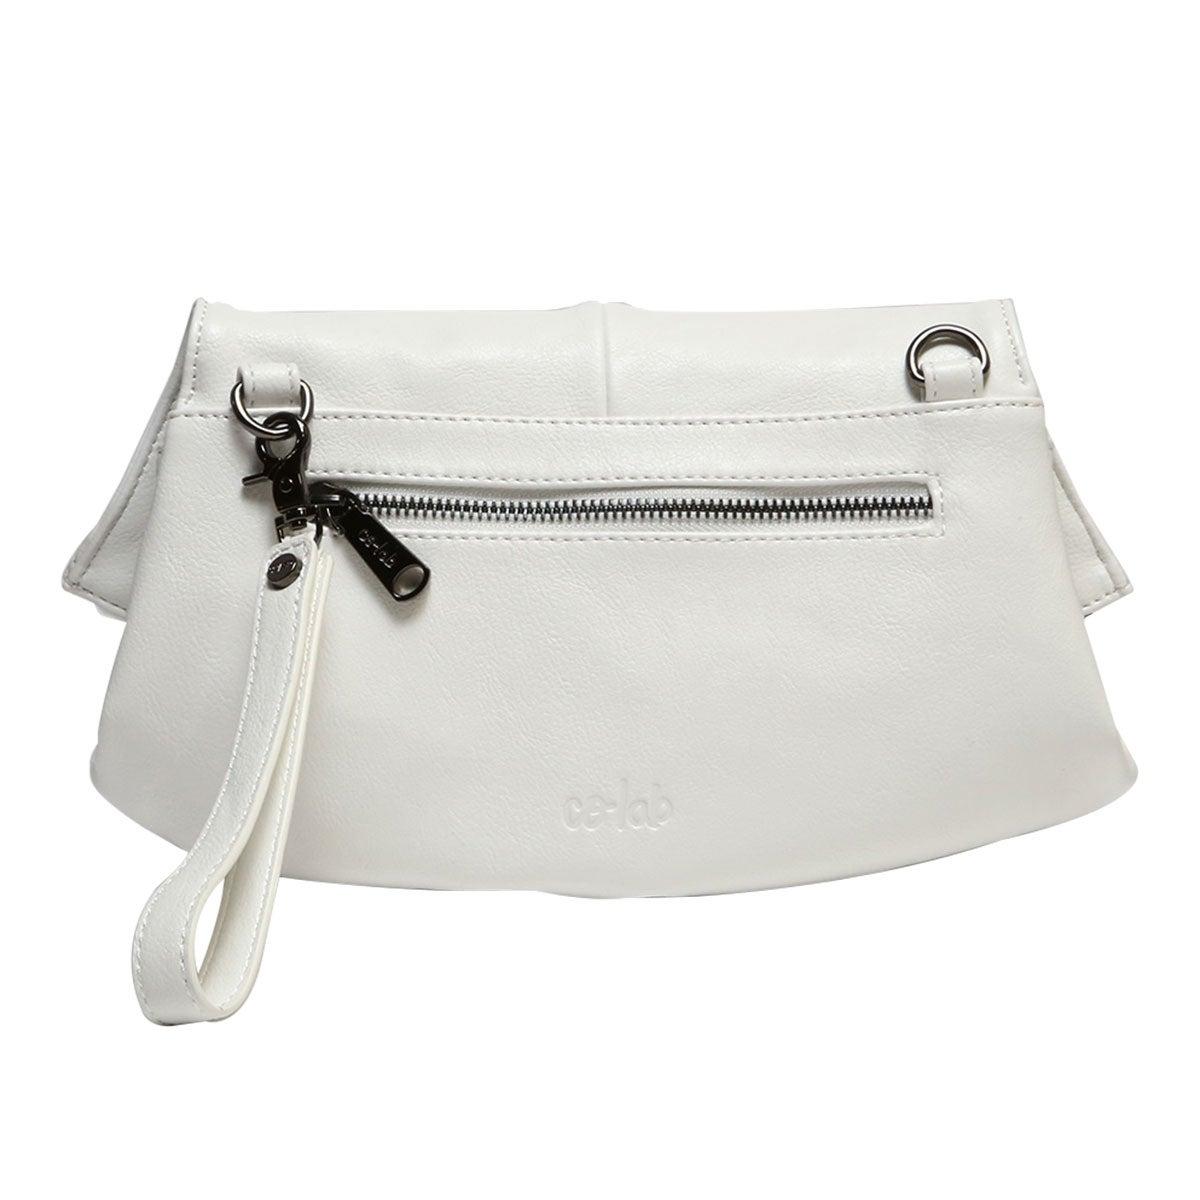 Lds Nora white 2 strap clutch